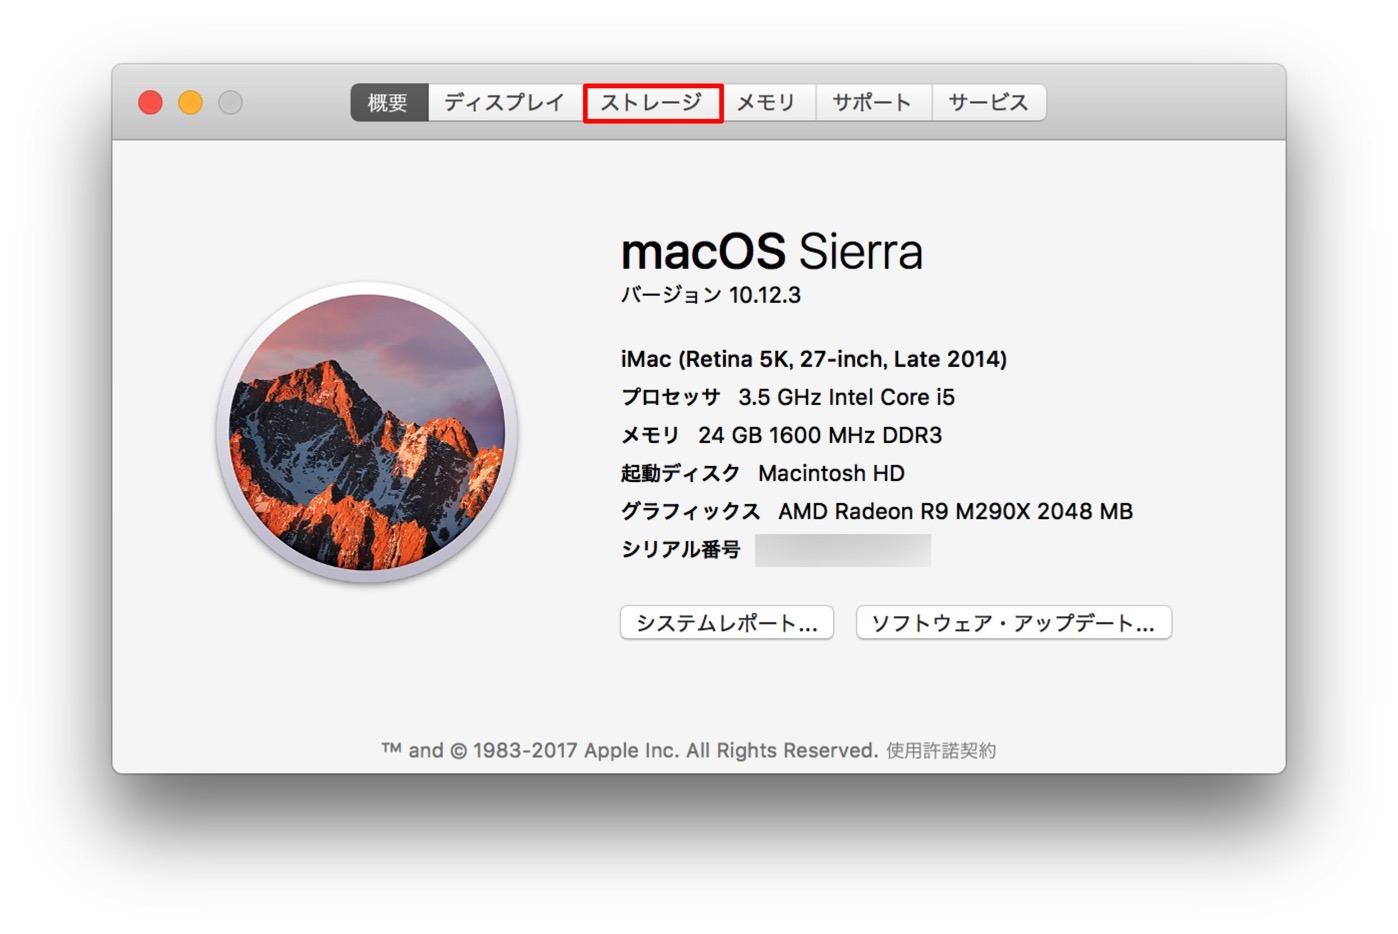 iMac 5K Retinaディスプレイモデル-3